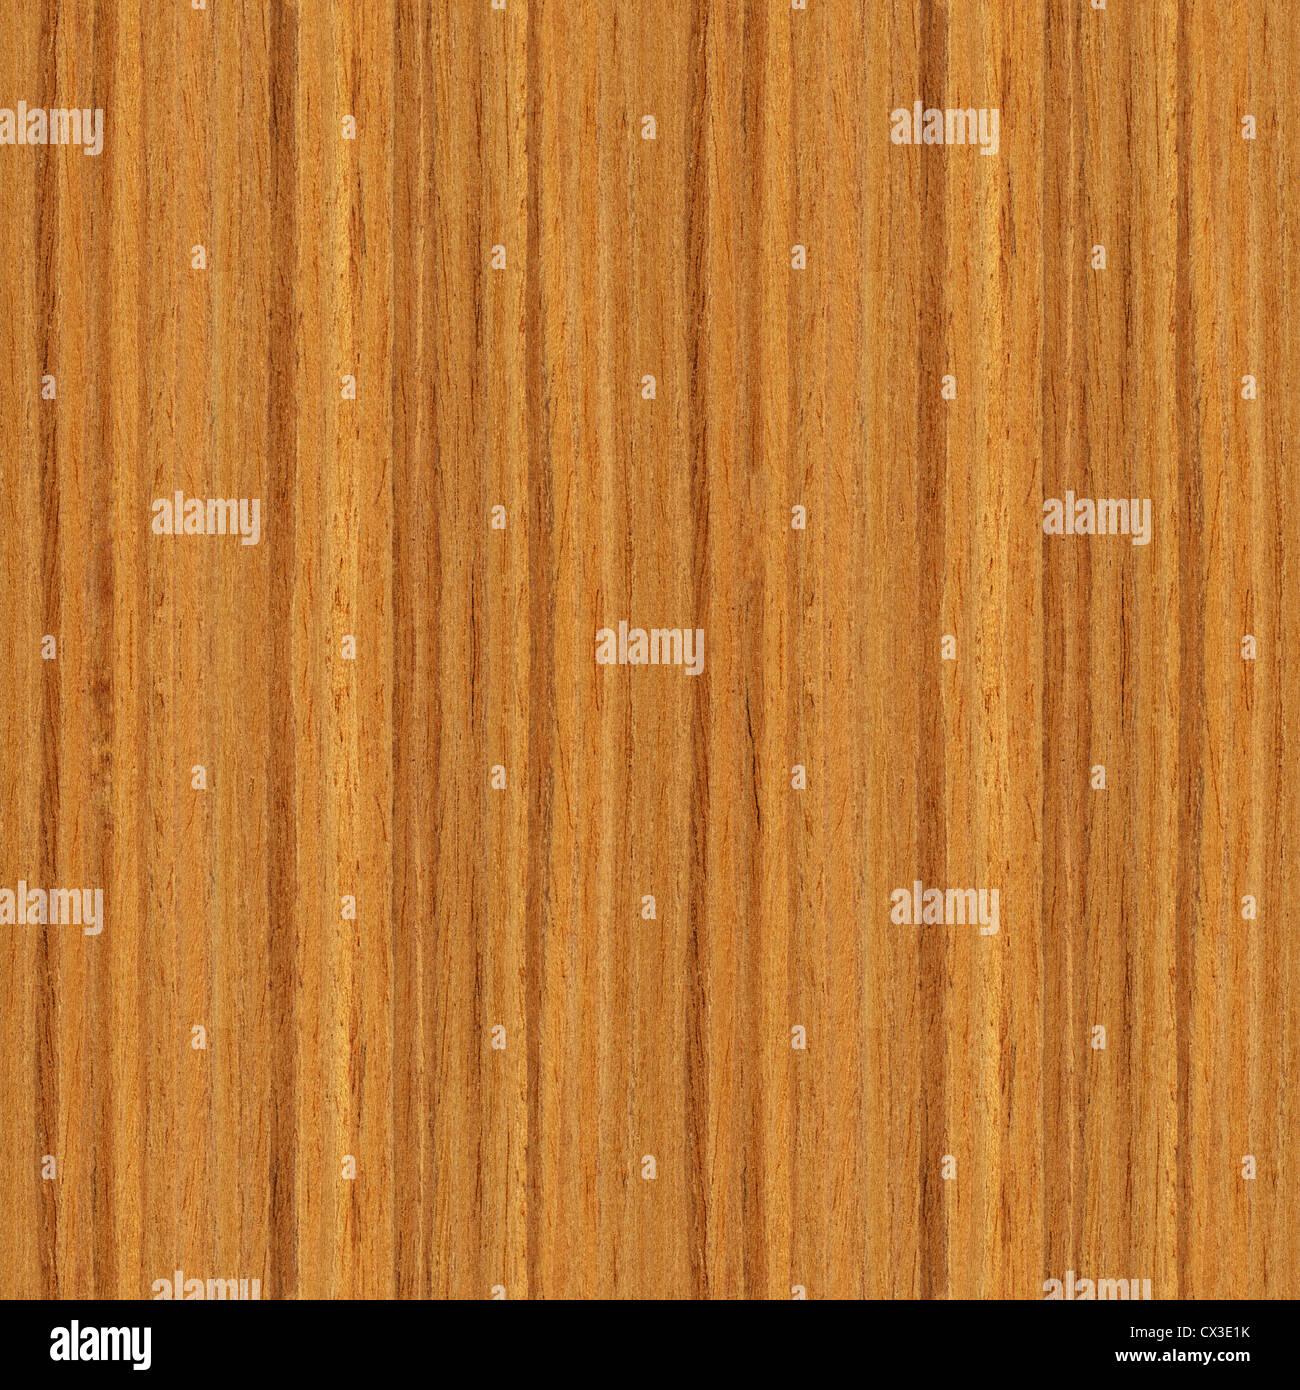 True Seamless Texture Of Teak High Detailed Wood Texture Series Stock Photo Alamy